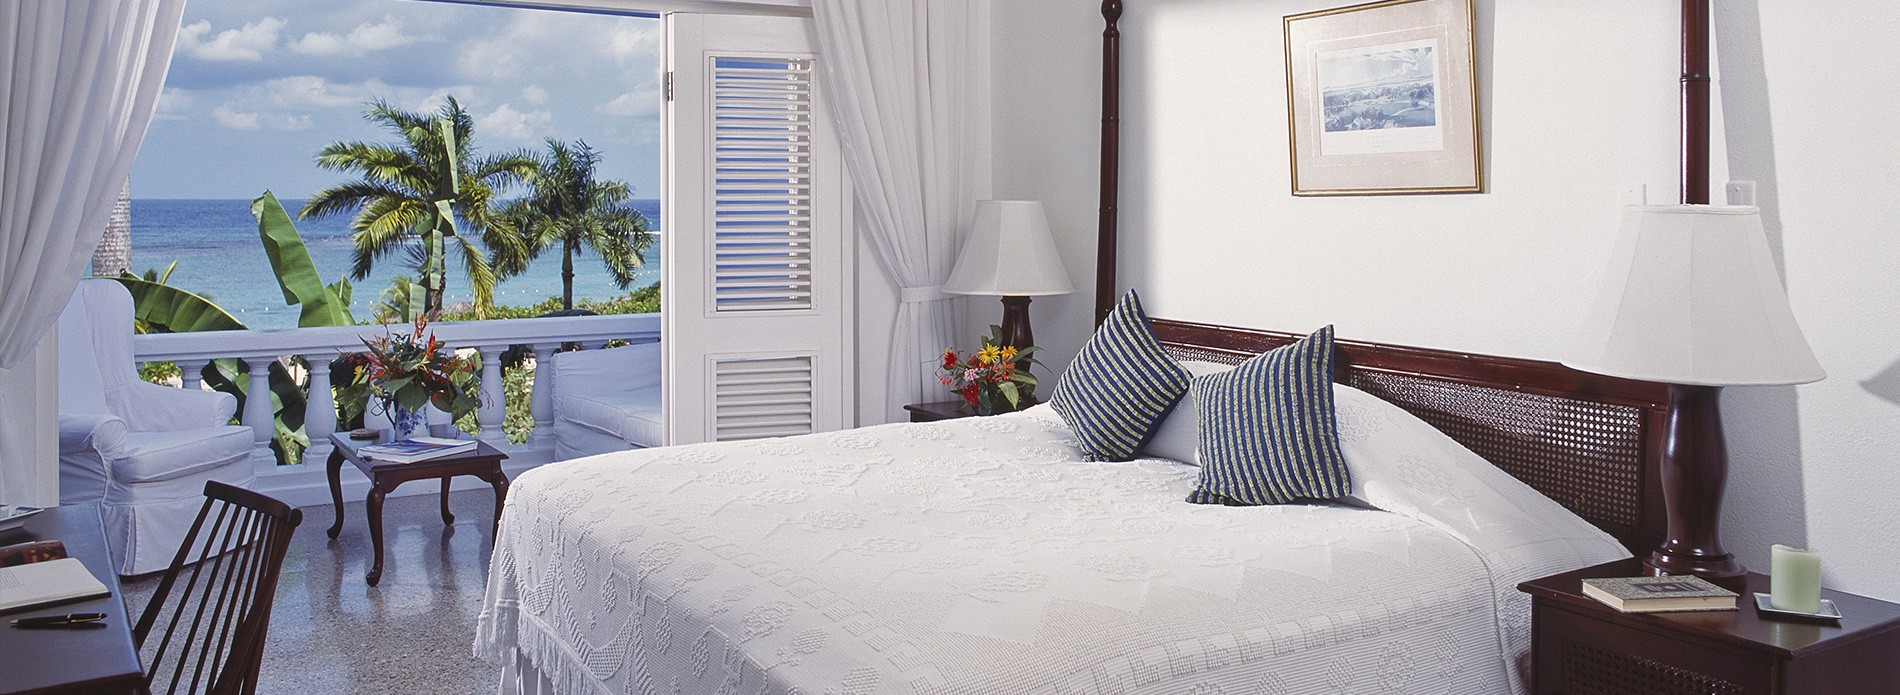 balcony-suite-bed-jamaica-inn